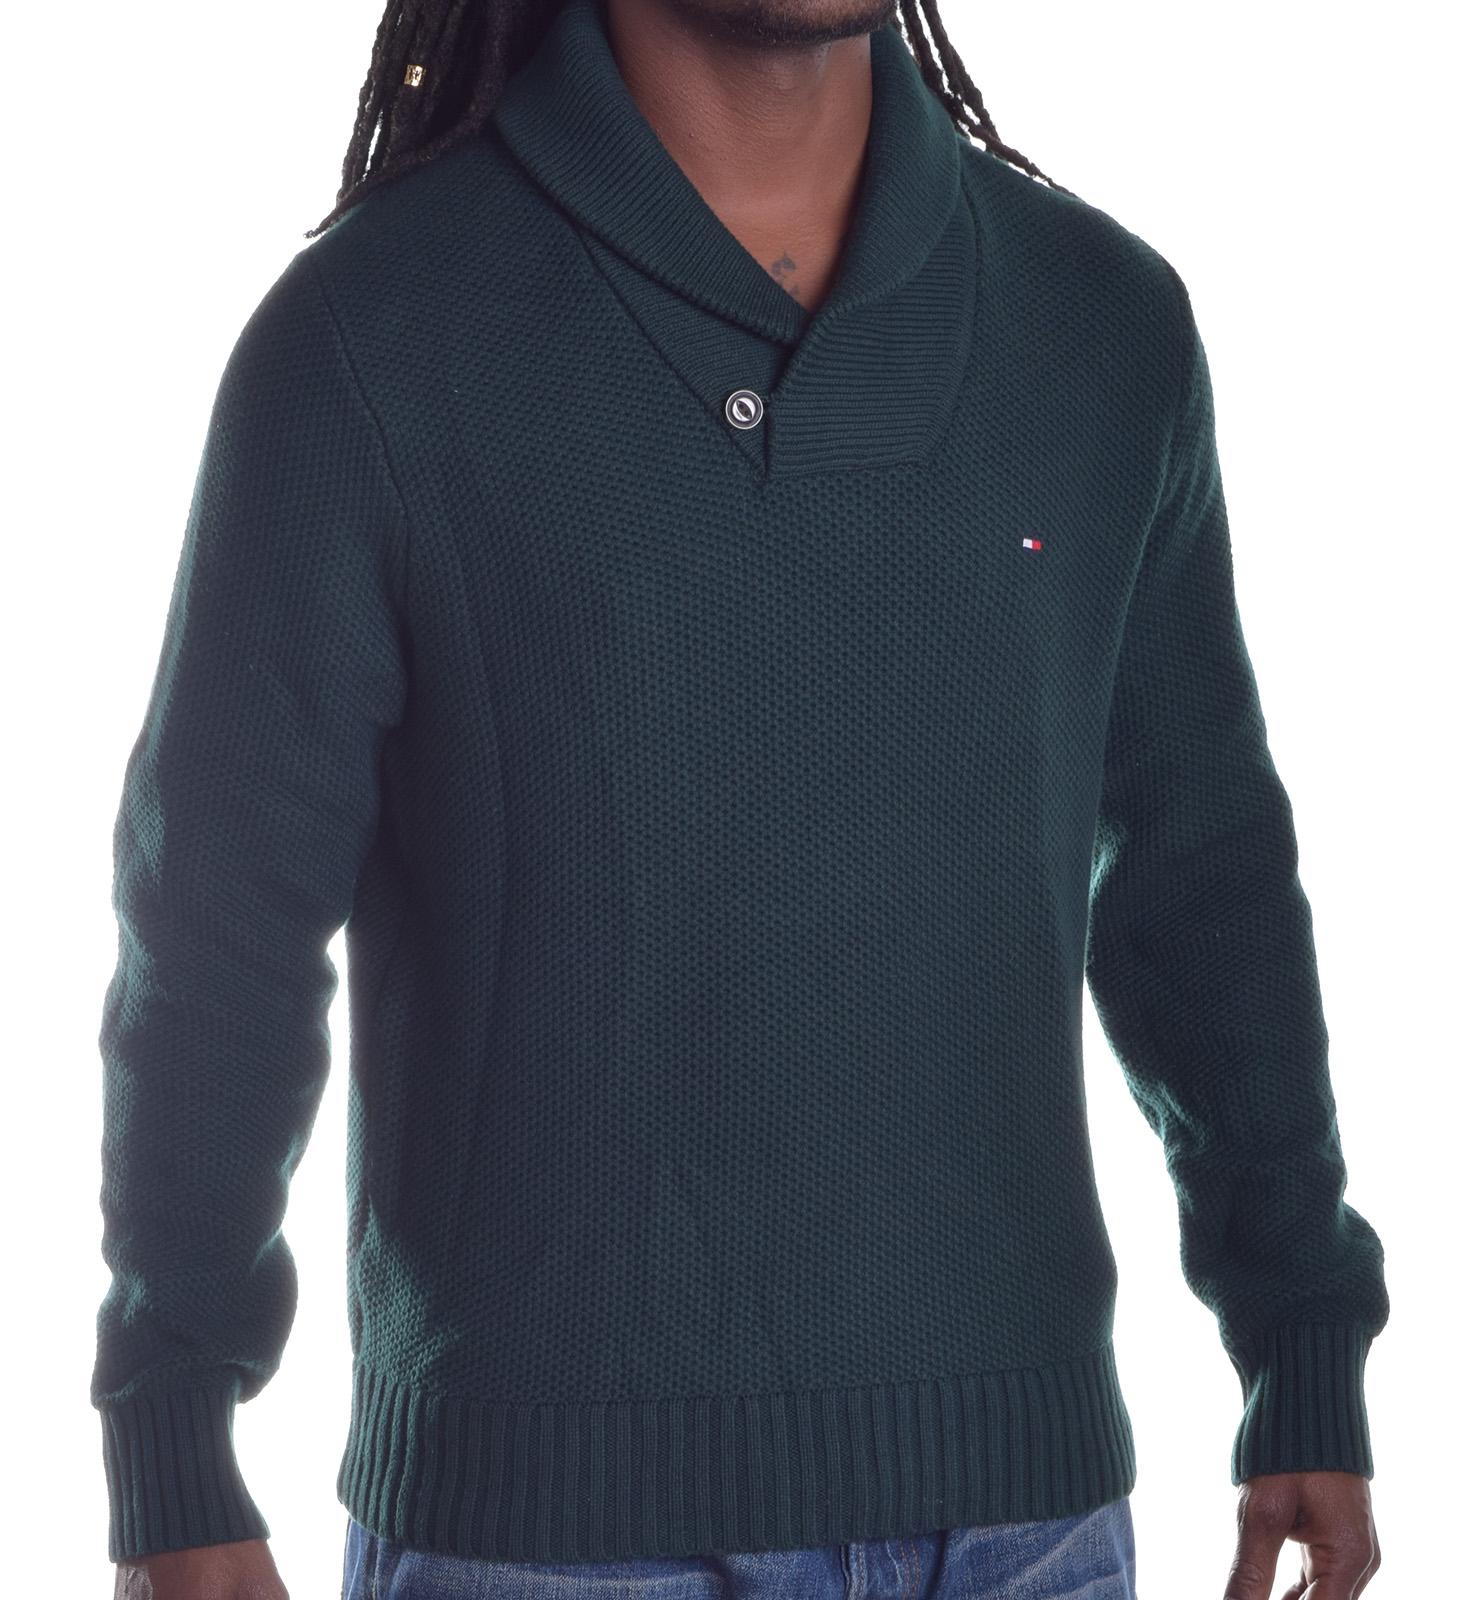 tommy hilfiger men 39 s wool shwal gift tower button pull over sweater ebay. Black Bedroom Furniture Sets. Home Design Ideas